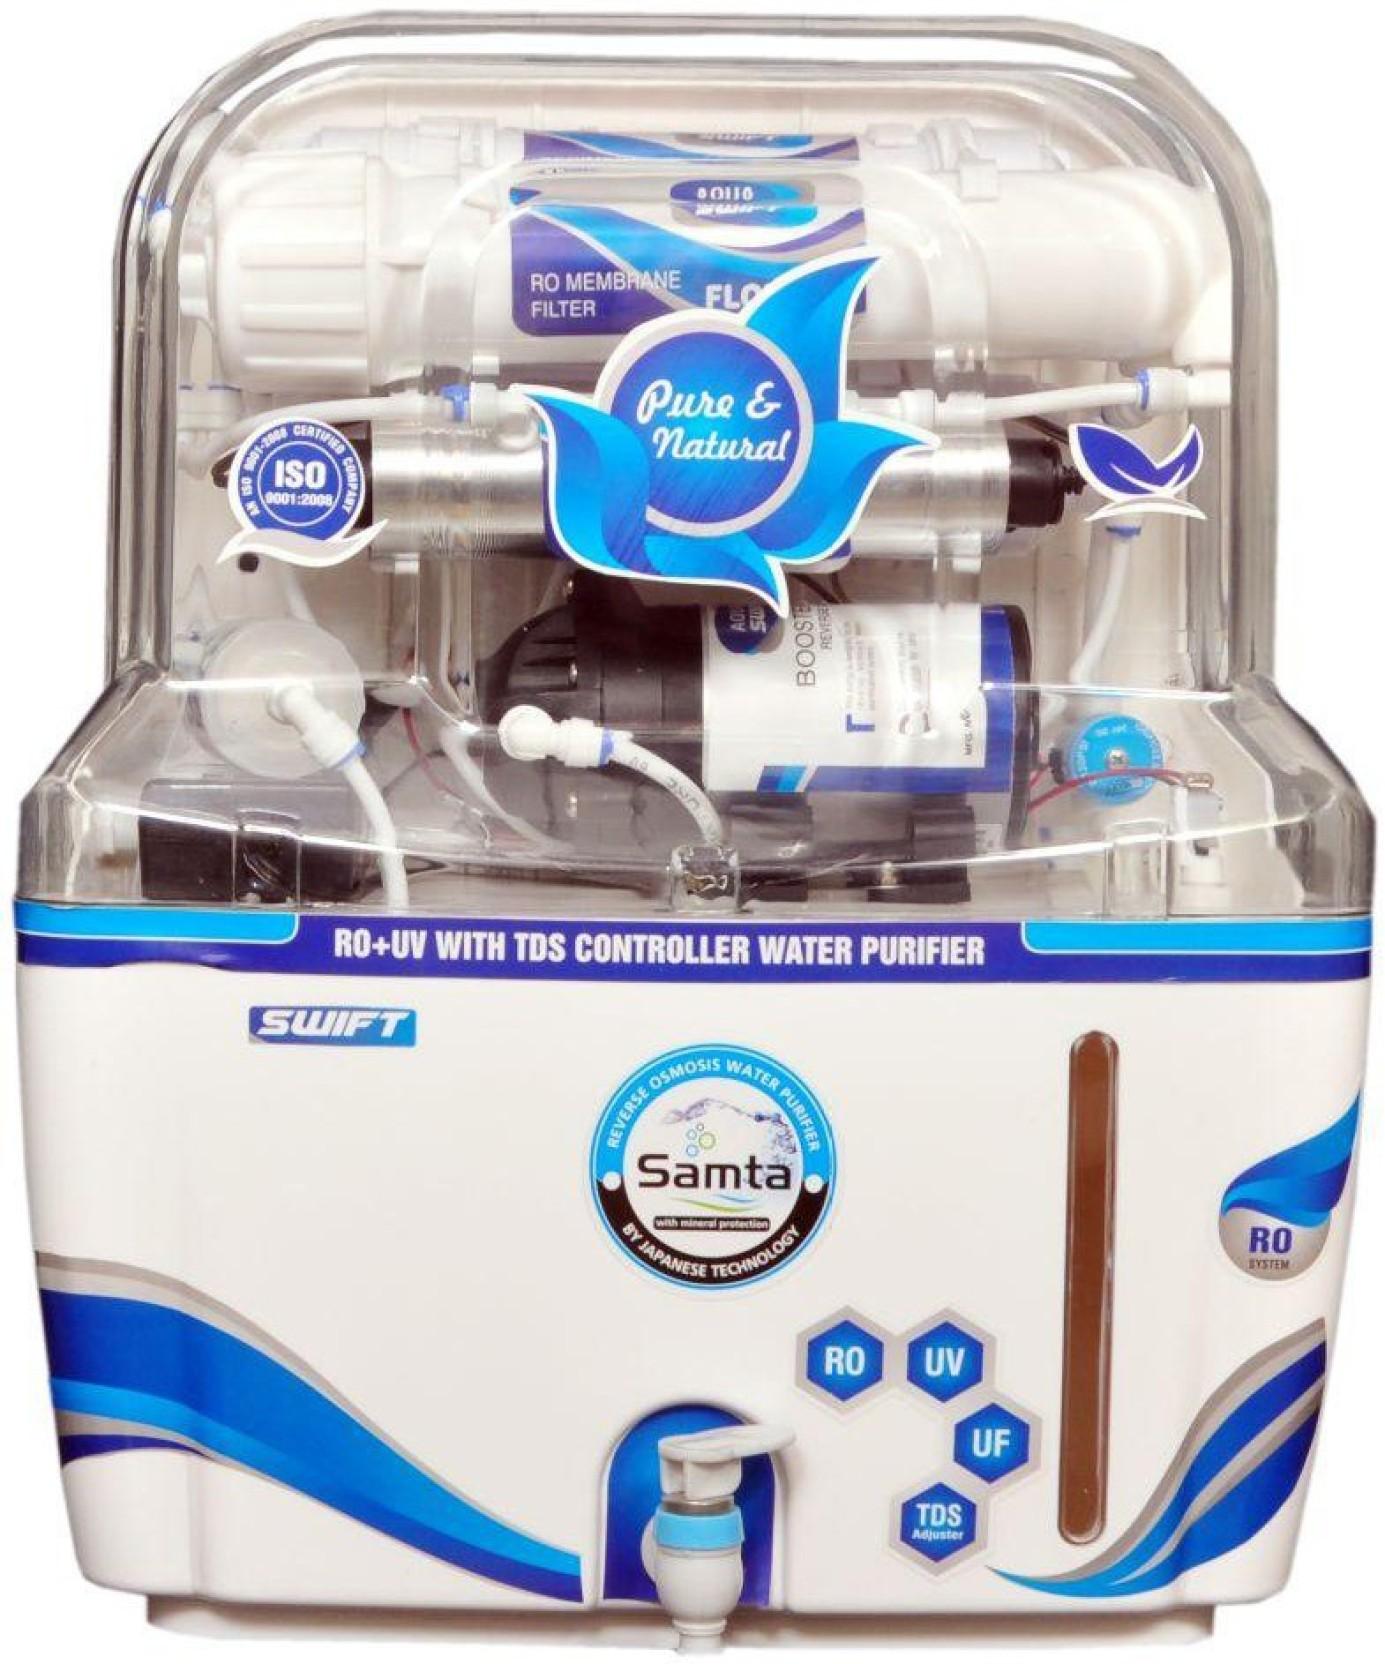 SAMTA 15 Litre Swift 14 Stage RO UV TDS MINERAL UF Water Purifier